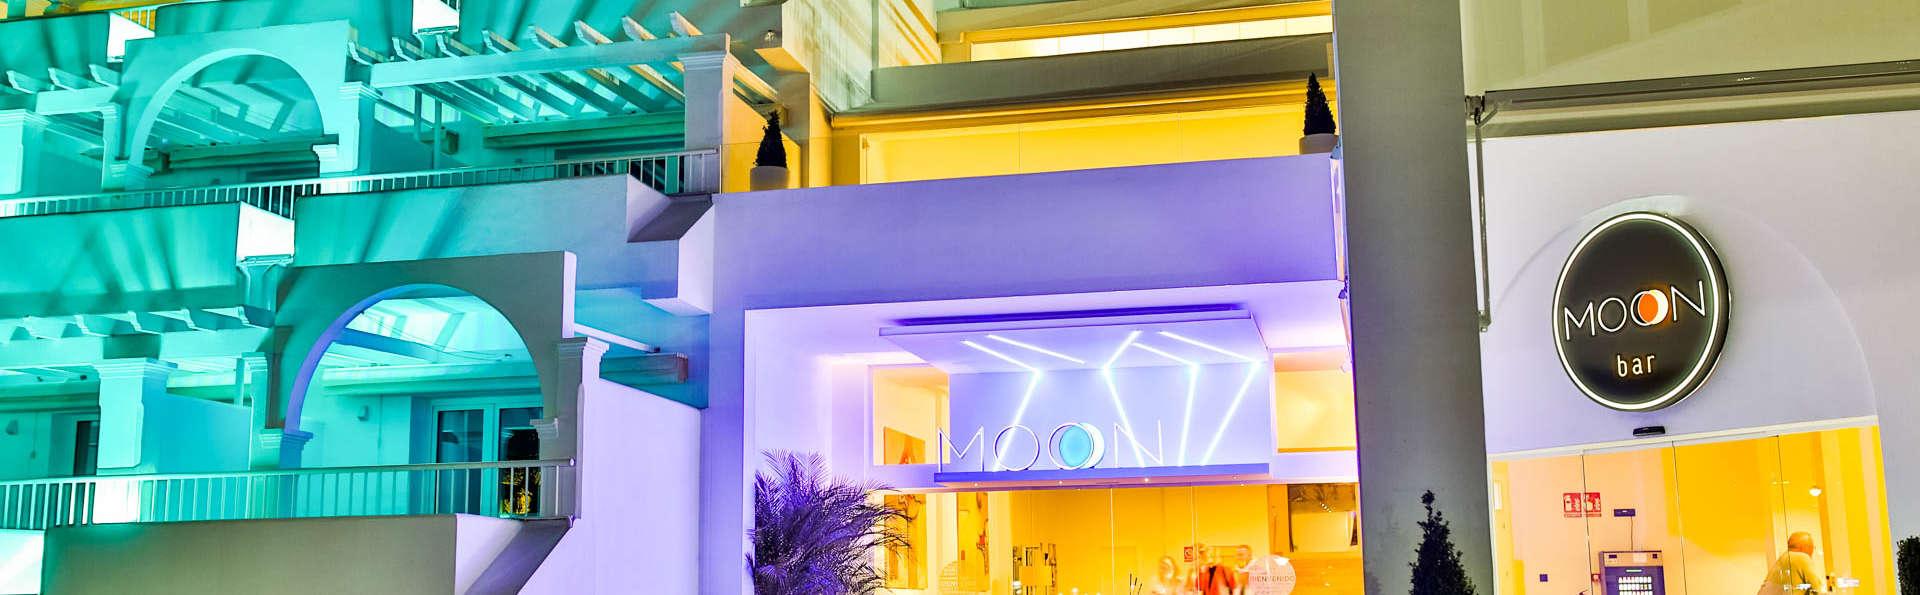 Moon Hotel & Spa - EDIT_FRONT.jpg